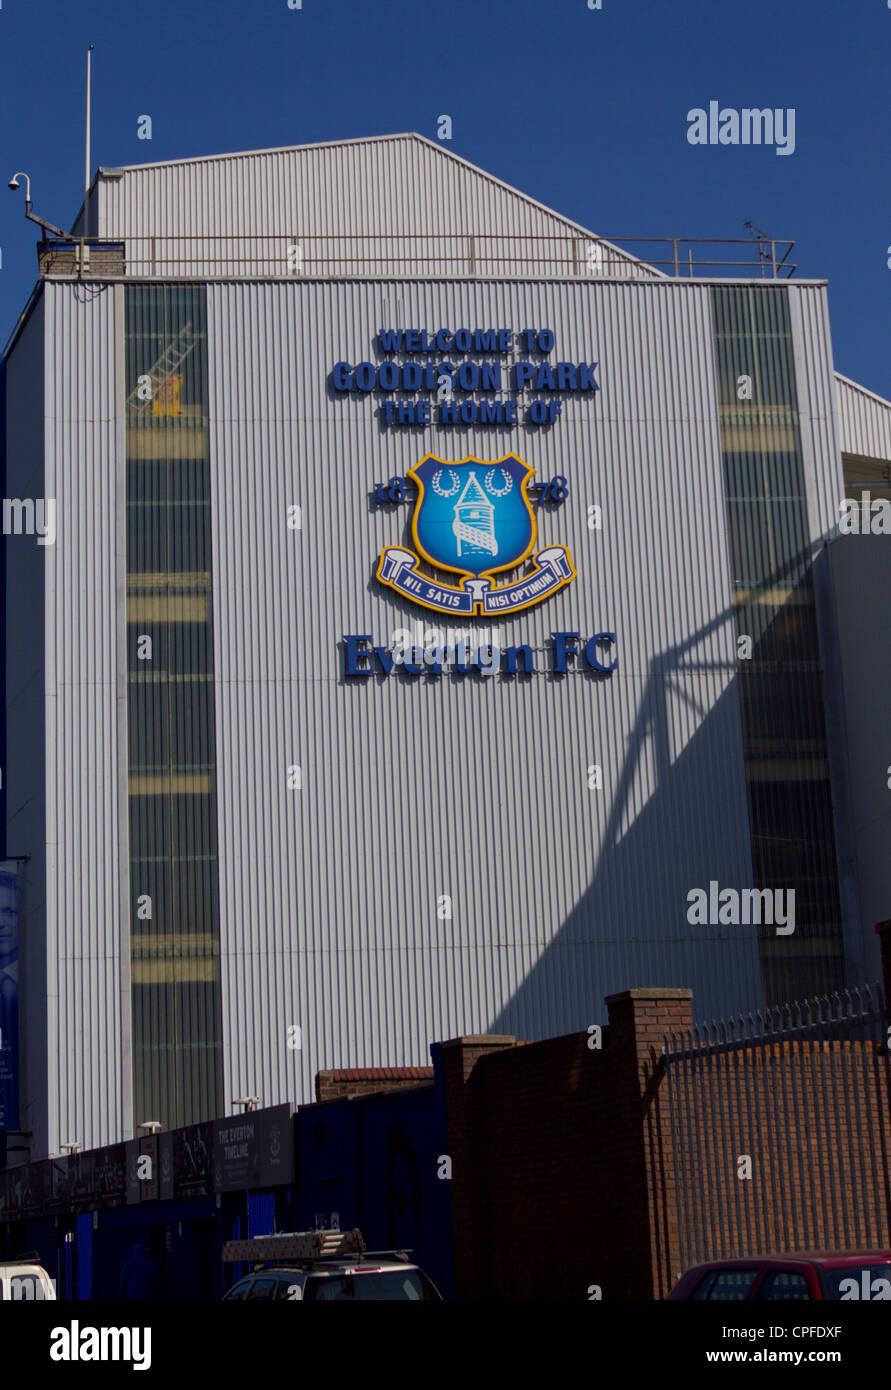 Exterior of Goodison Park, Home of Everton Football Club Stock Photo